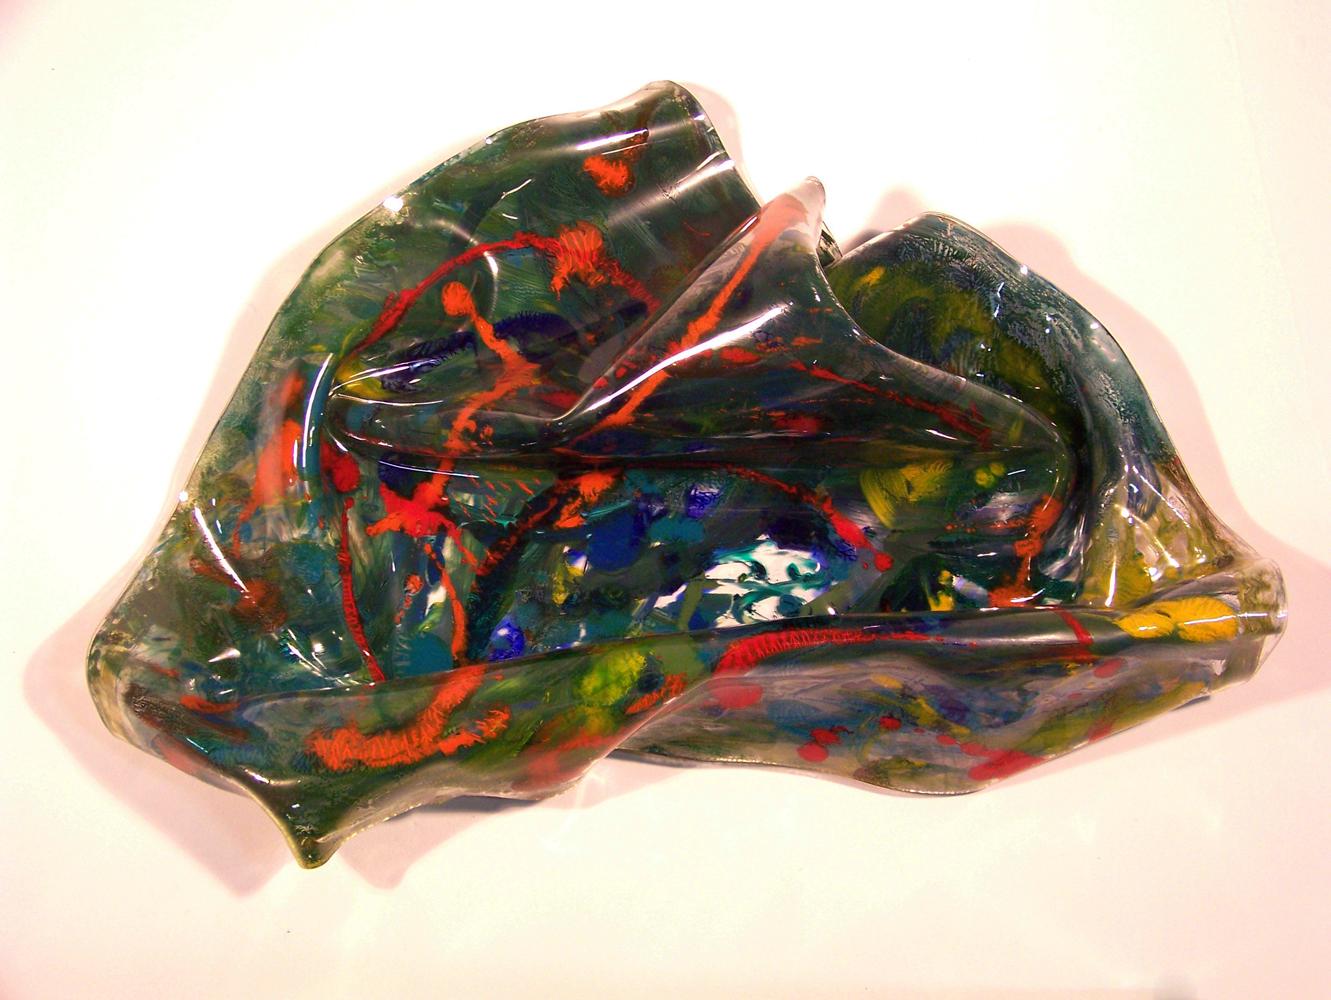 "LiquidArt#8 / 38""H x 32"" W x 15"" D / Reverse Acrylic Paint on Acrylic"